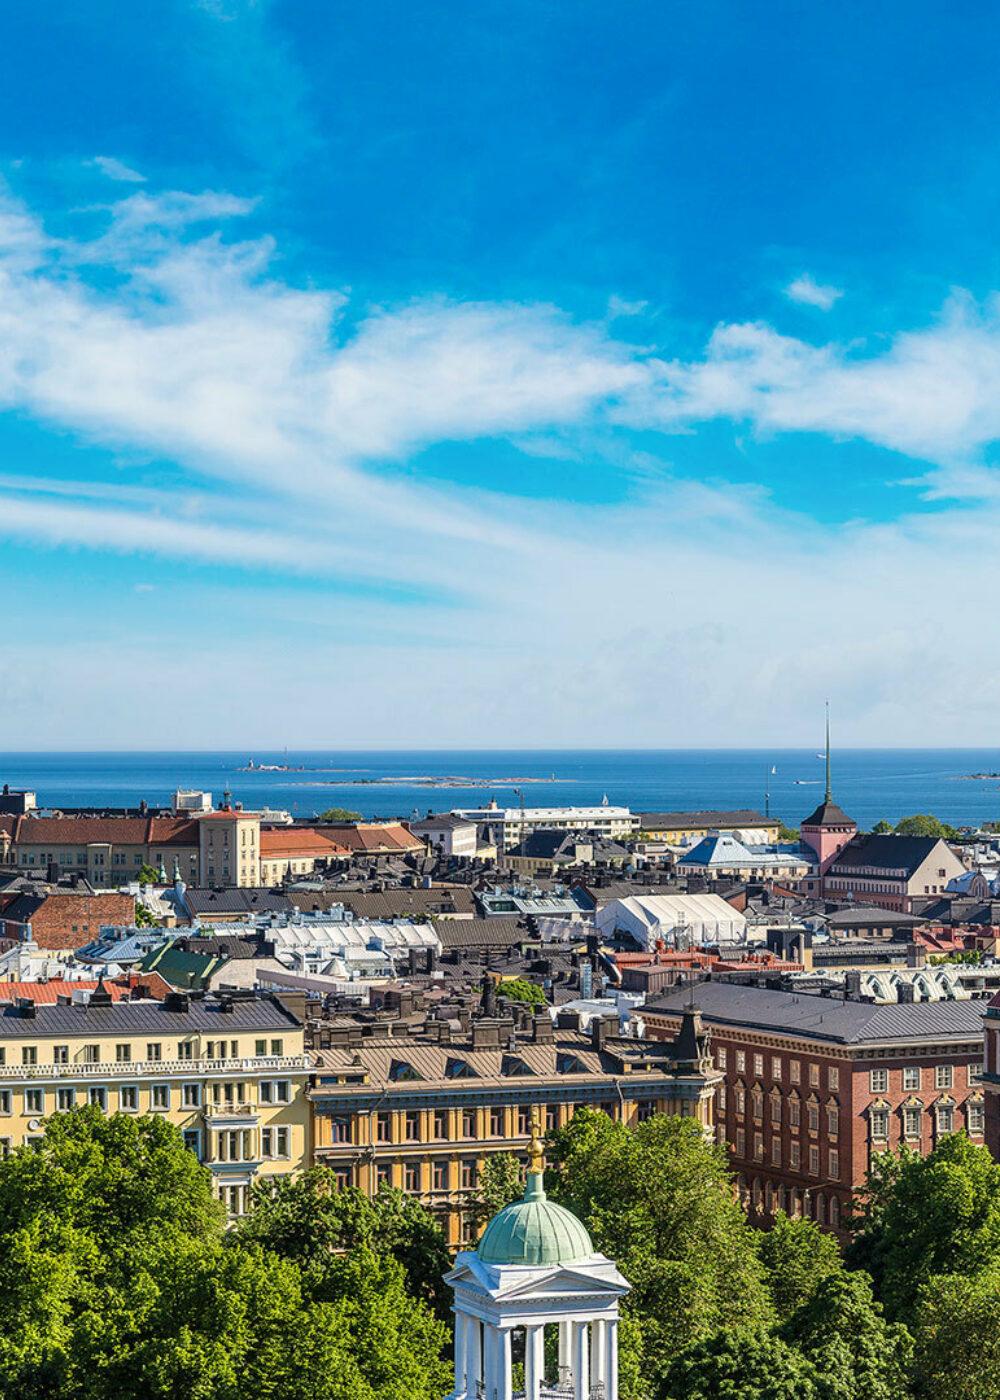 Green Motion Car Rental Finland Helsinki Downtown Hotel Valo 1440x1080